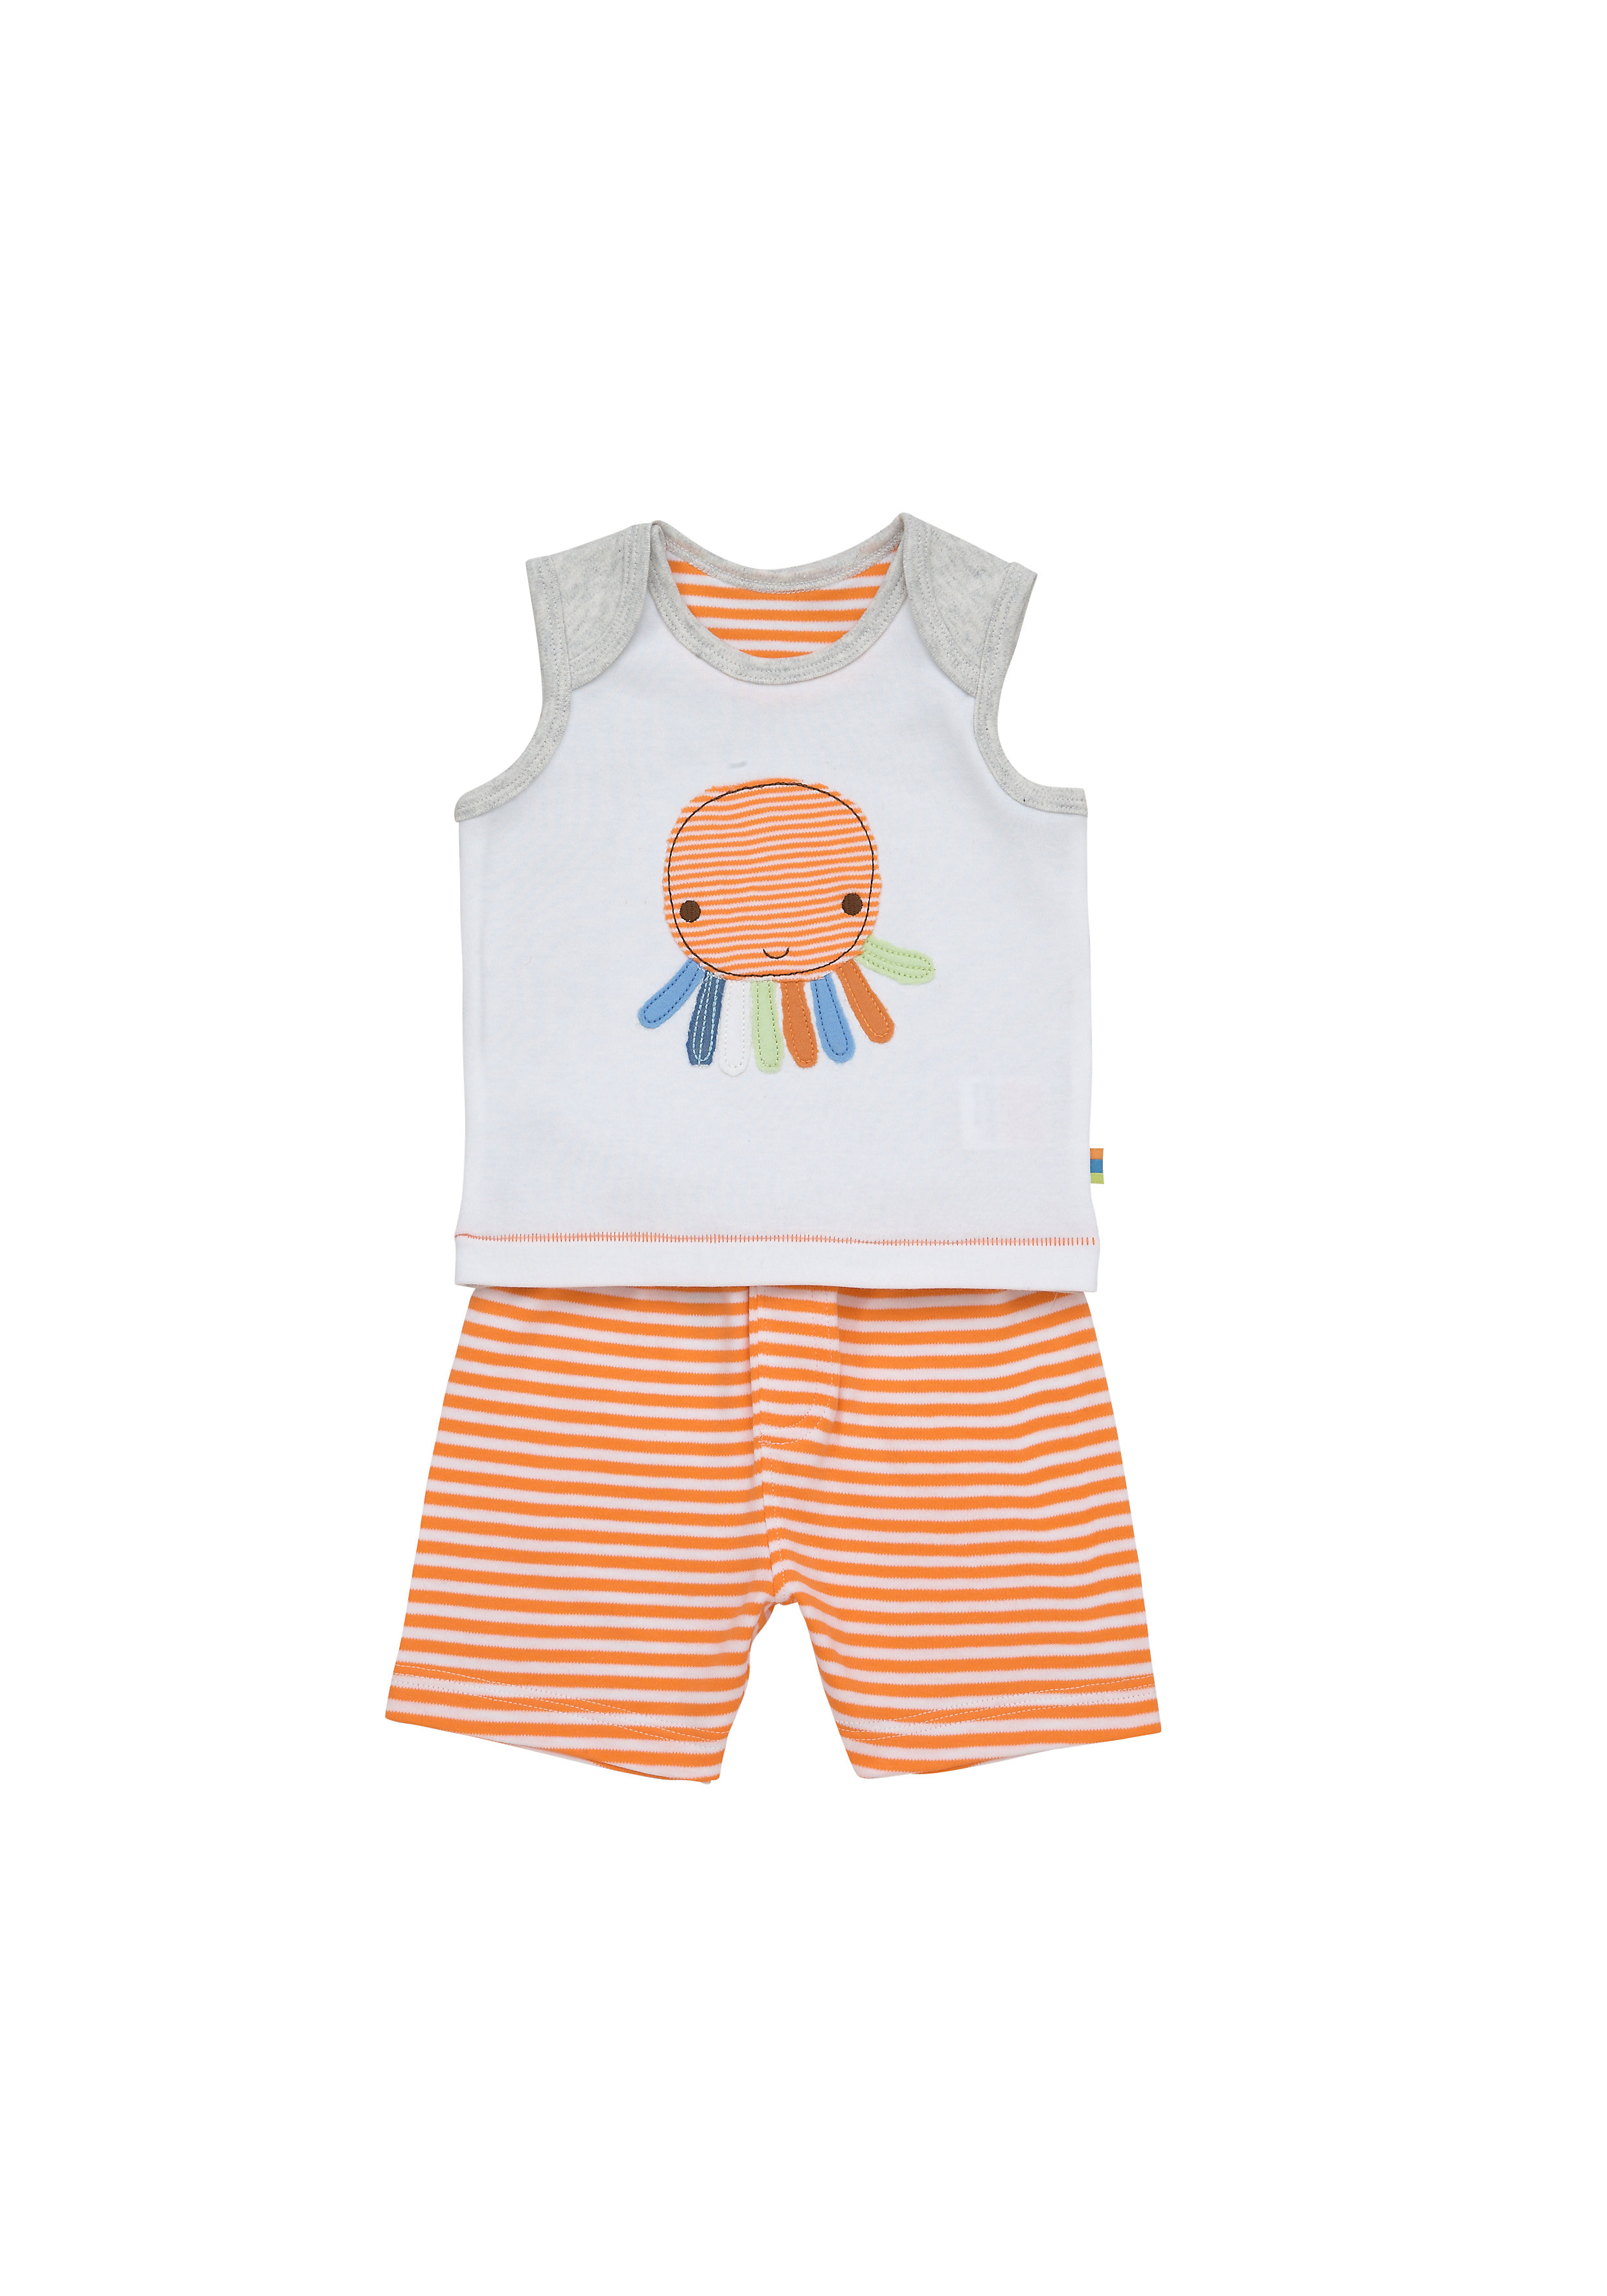 Mothercare | Boys Sleeveless T-Shirt And Shorts Set Octopus Patchwork - Orange